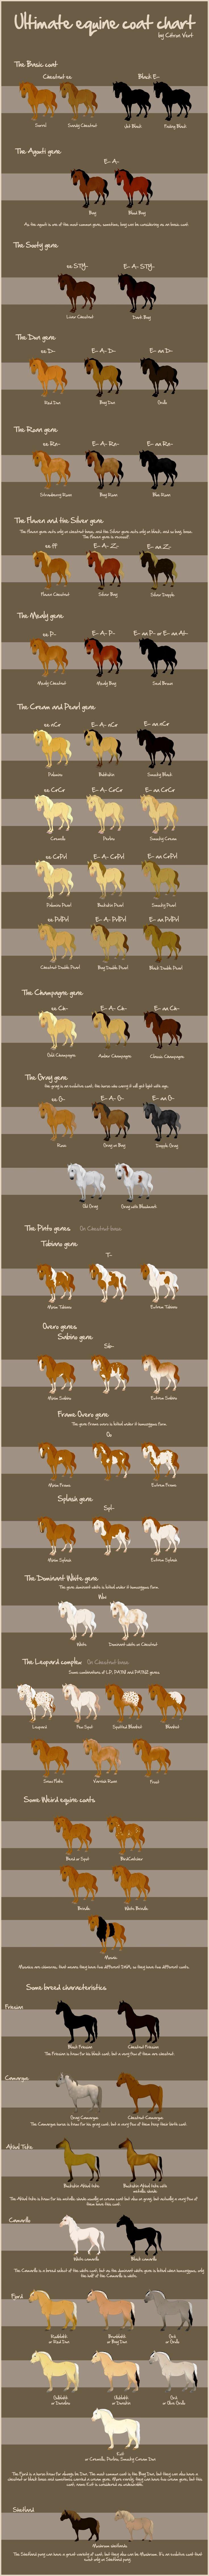 www.pegasebuzz.com   Les robes du cheval en anglais